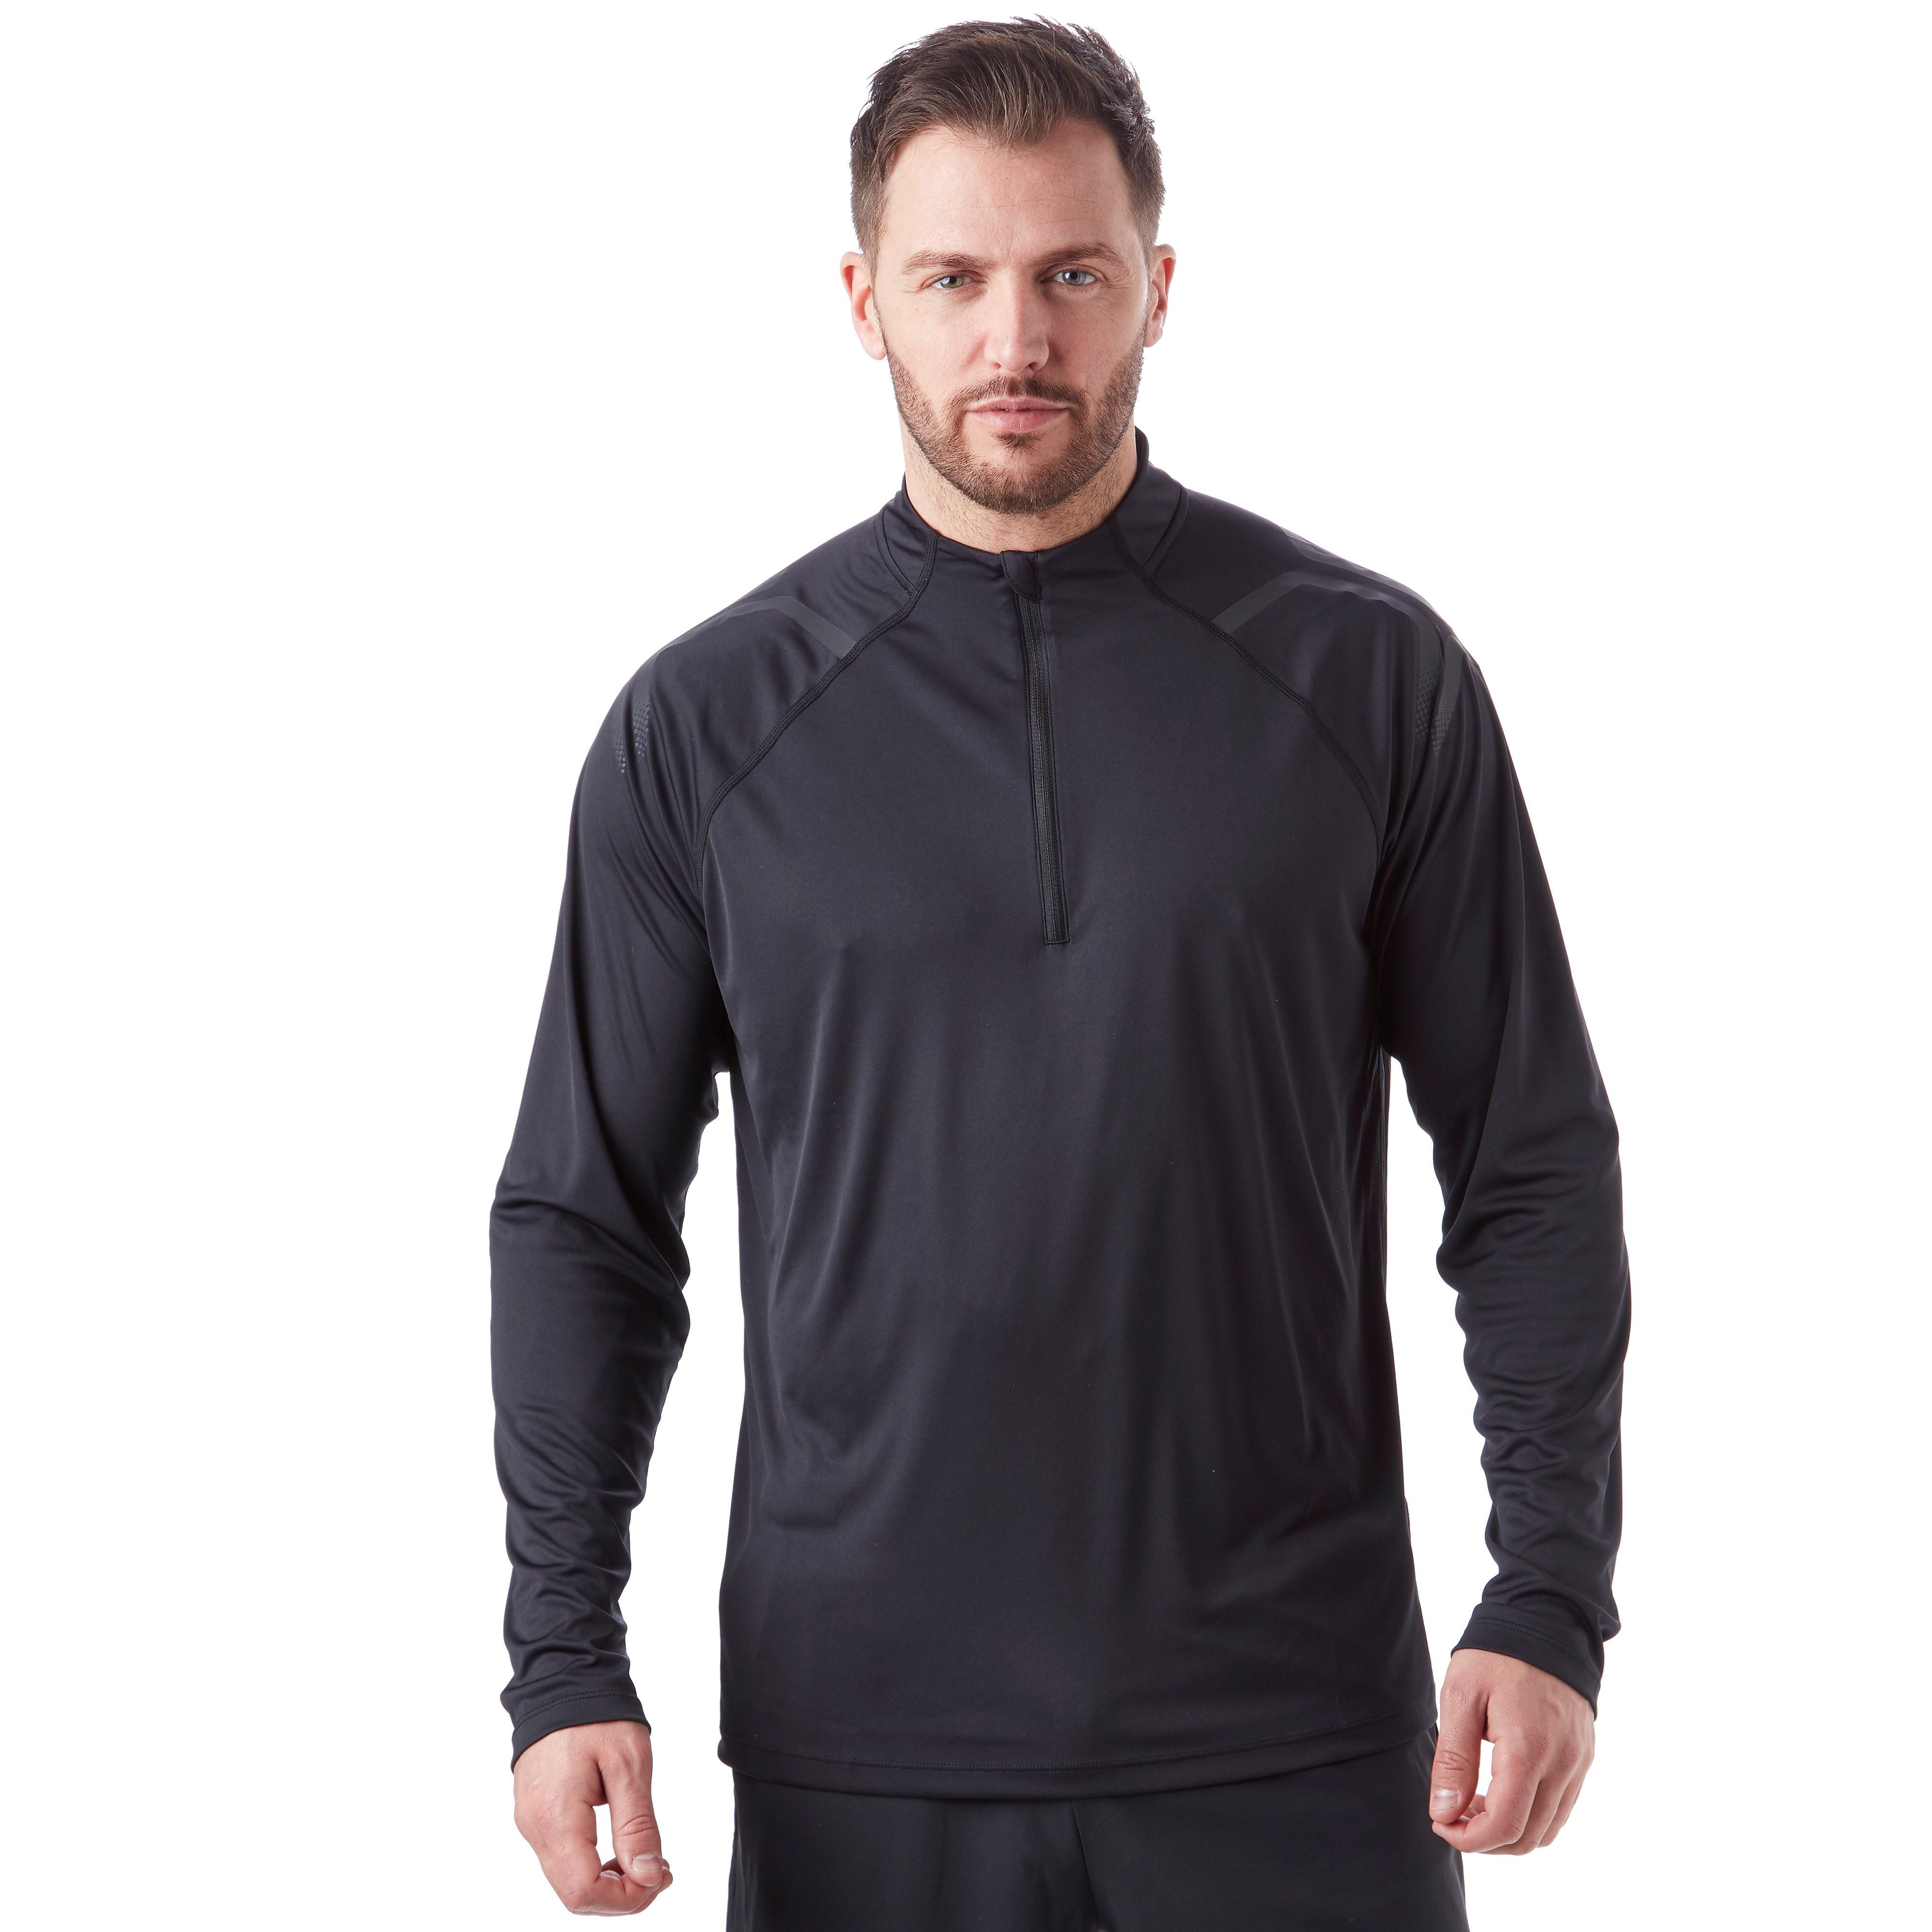 ASICS Icon ½ Zip Long Sleeved Men's Running Top